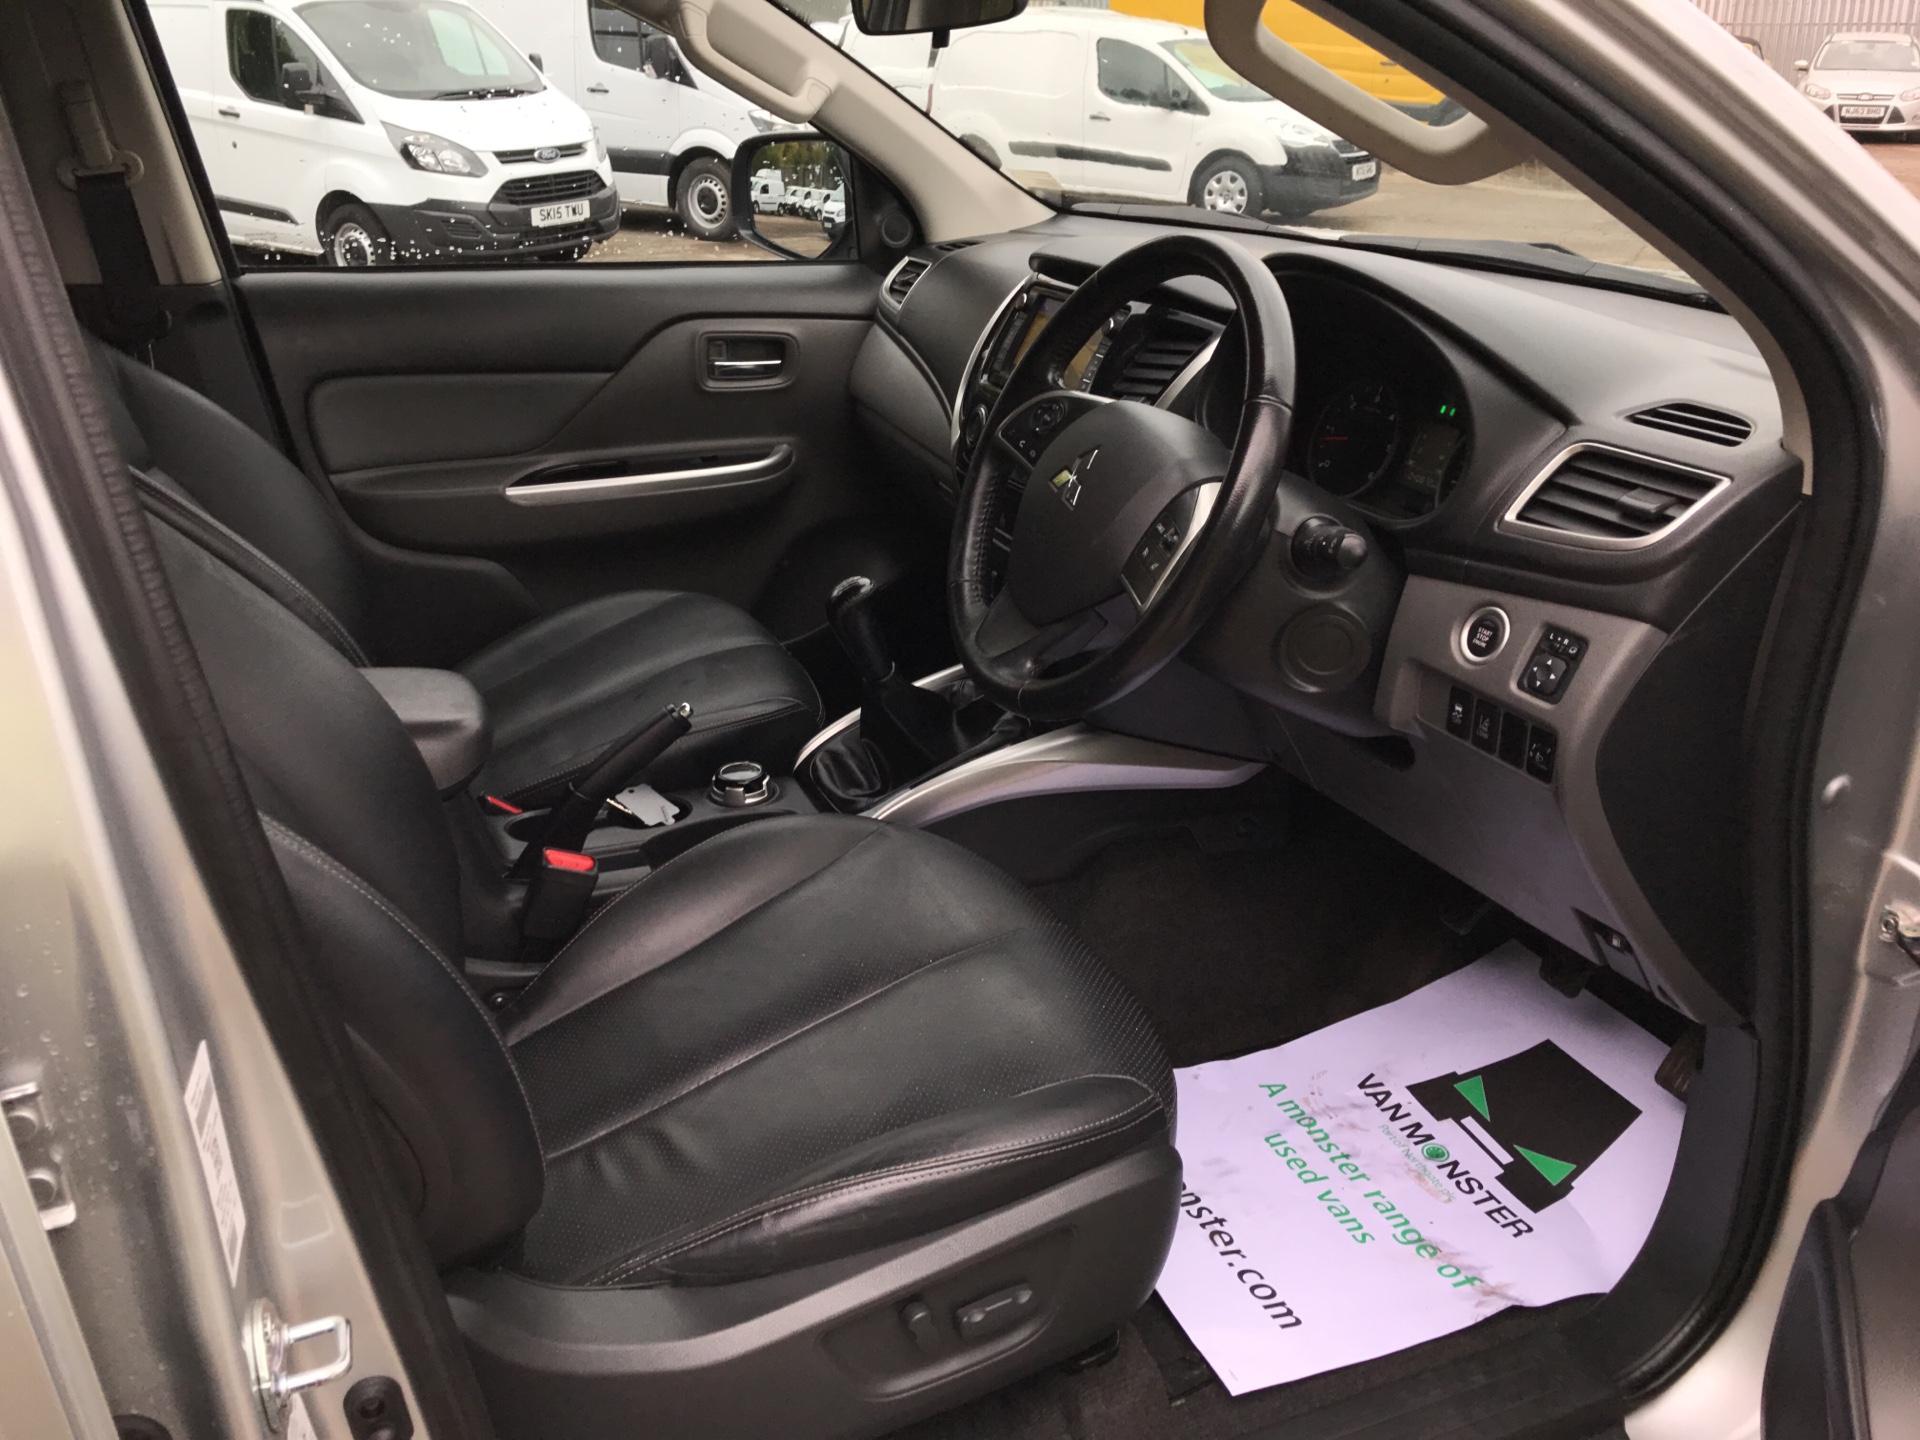 2016 Mitsubishi L200 DOUBLE CAB DI-D 178PS WARRIOR 4WD EURO 5 (WN66WXS) Image 9